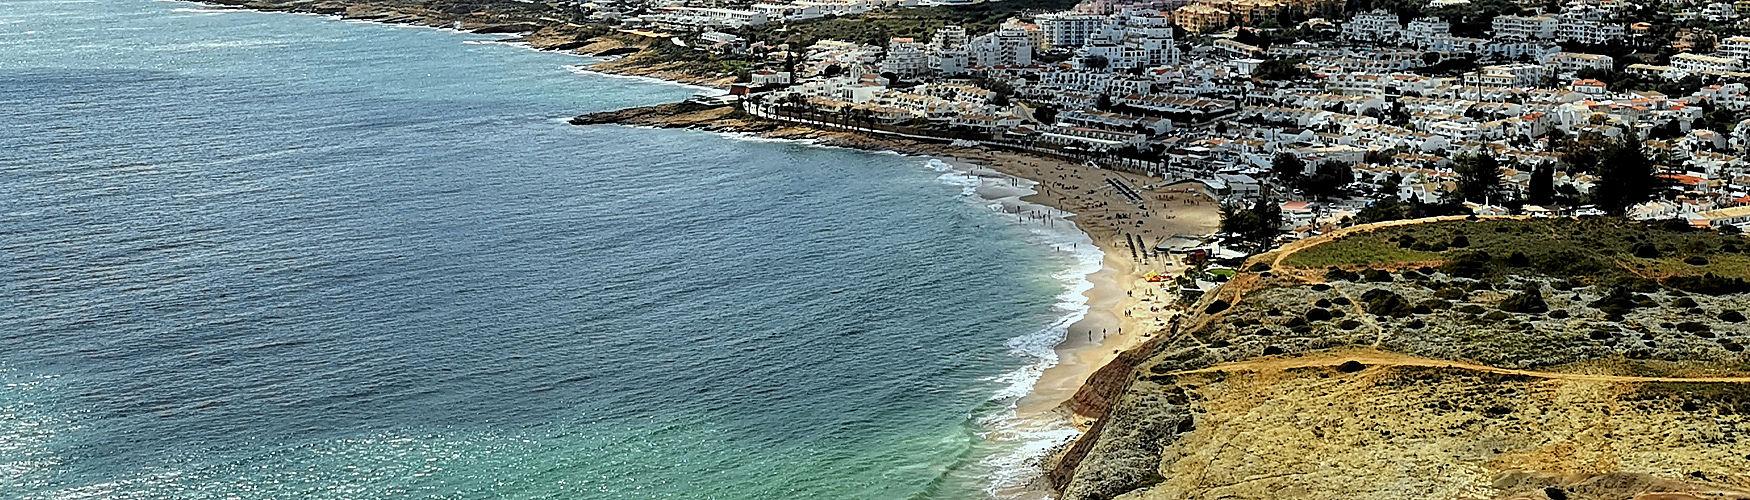 Cover image for Praia da Luz